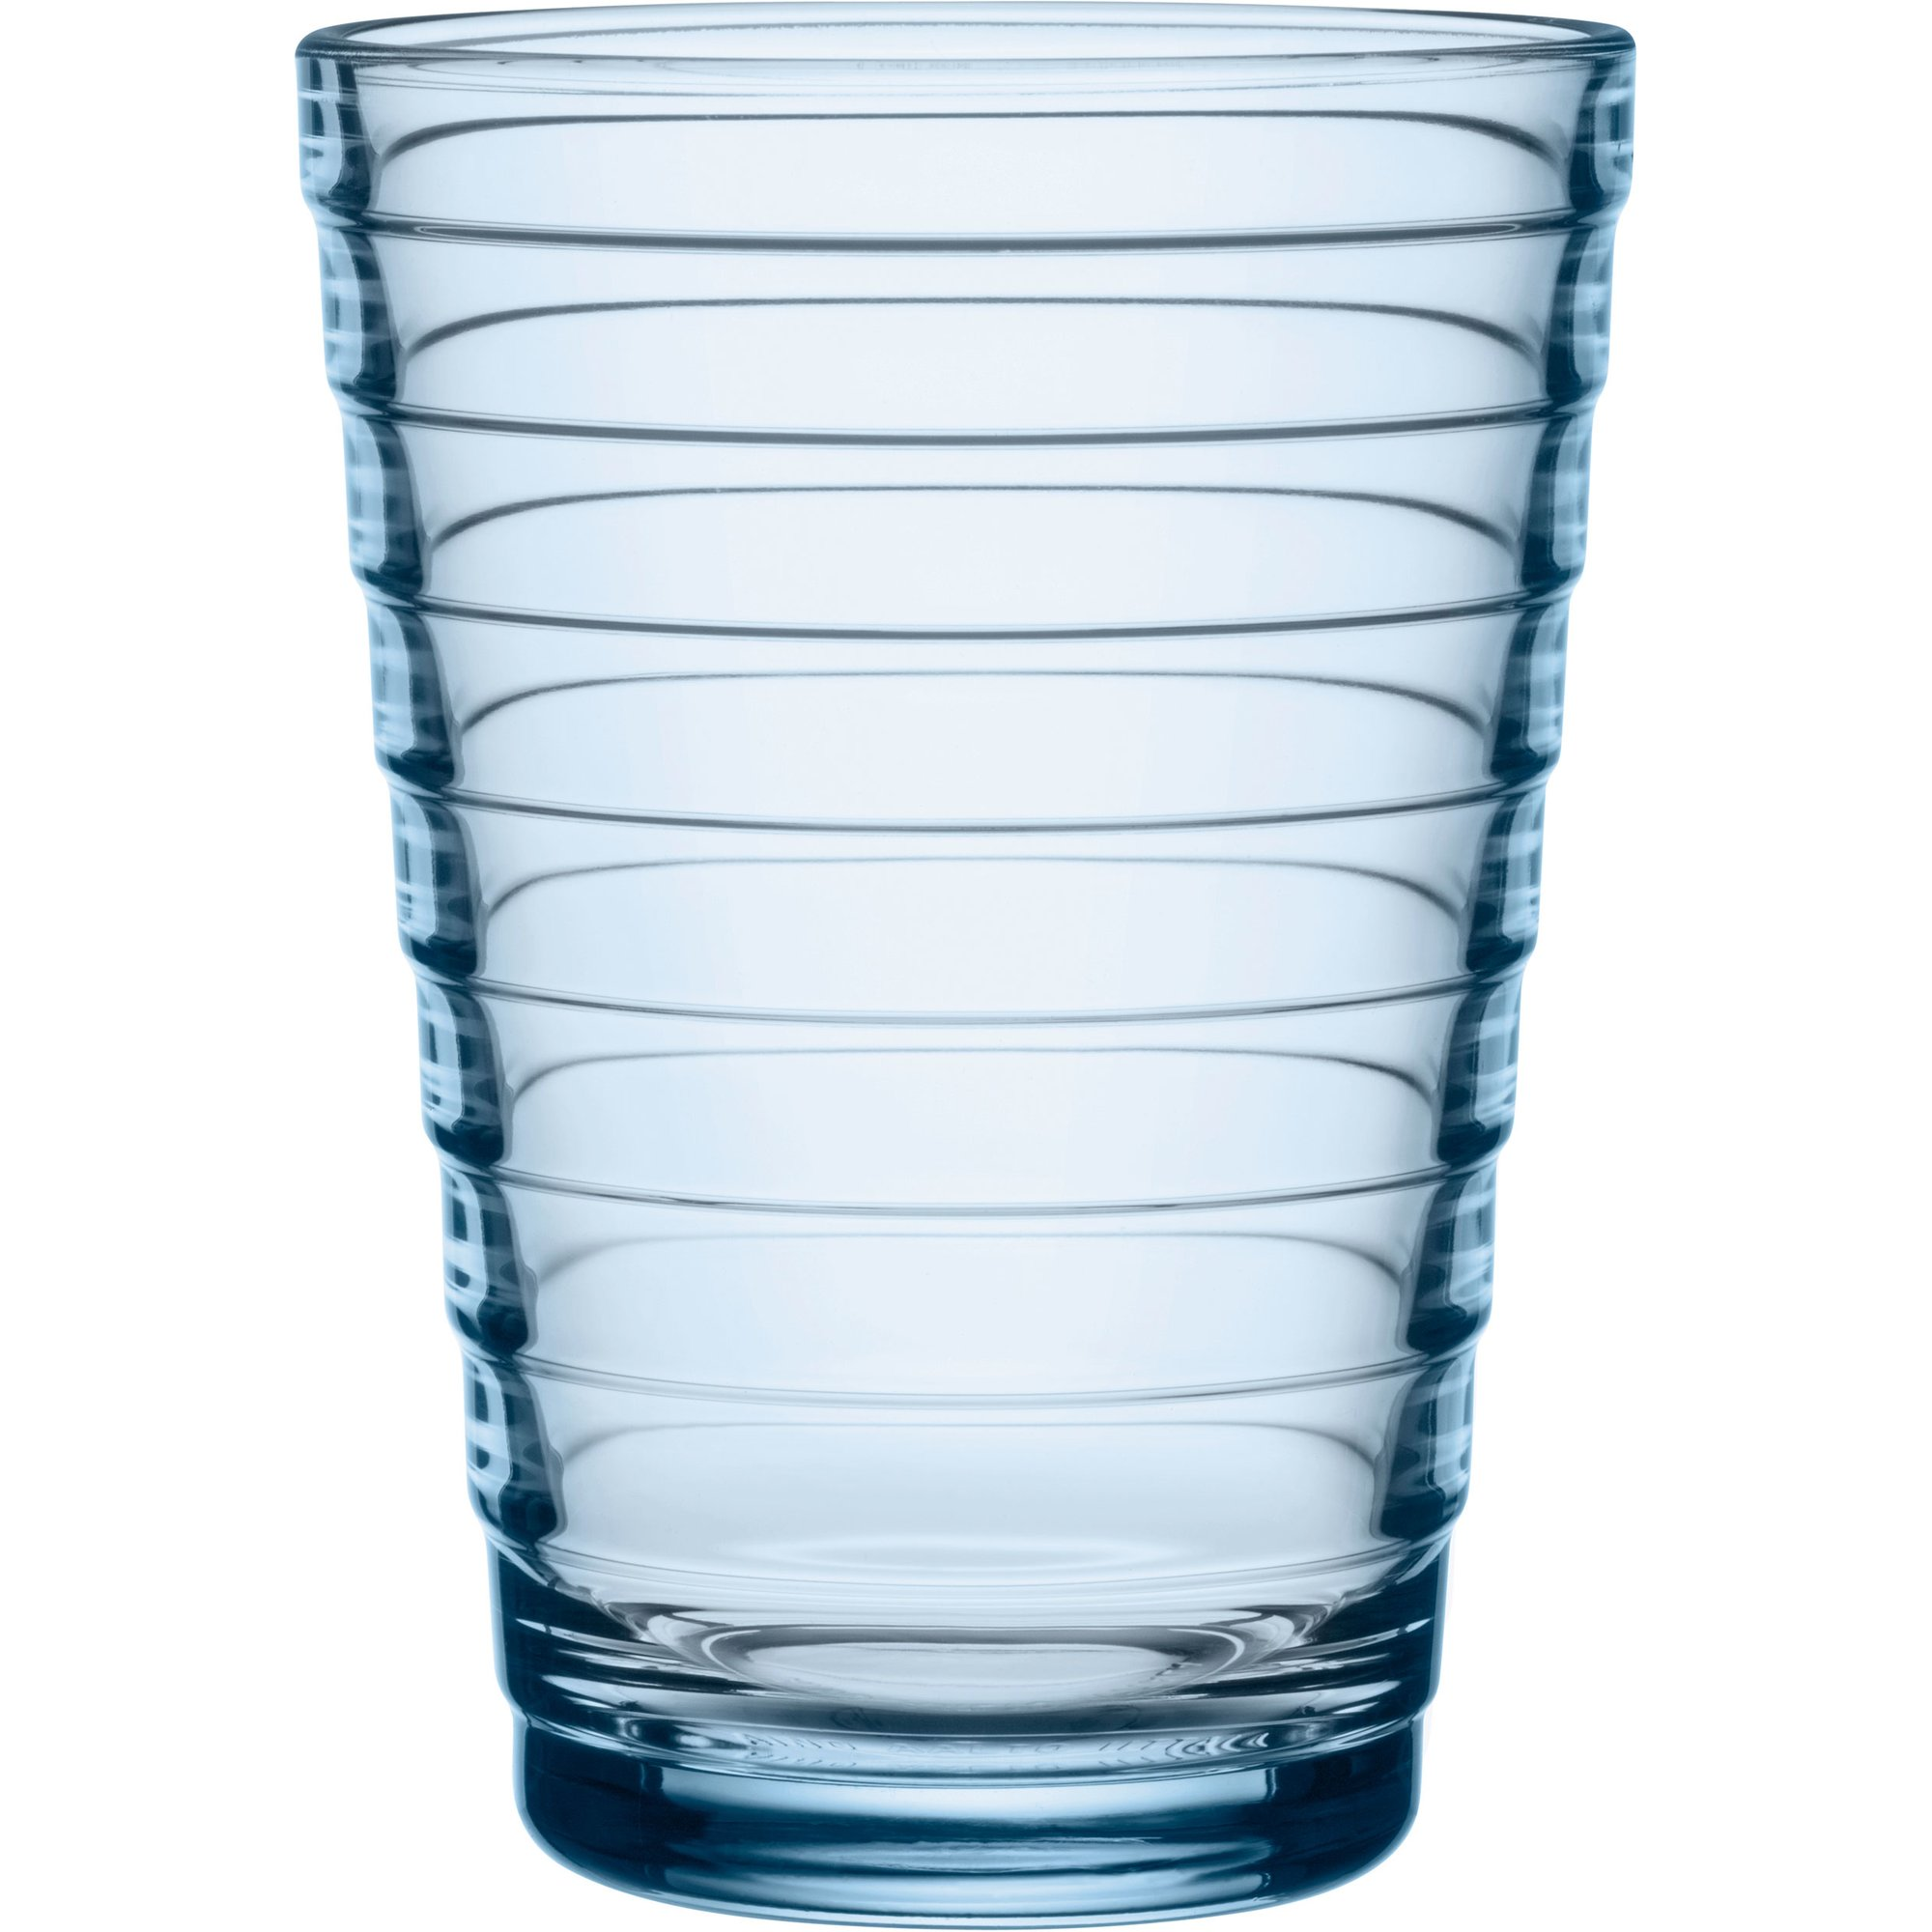 Iittala Aino Aalto Vattenglas 33 cl. 2 st Aqua